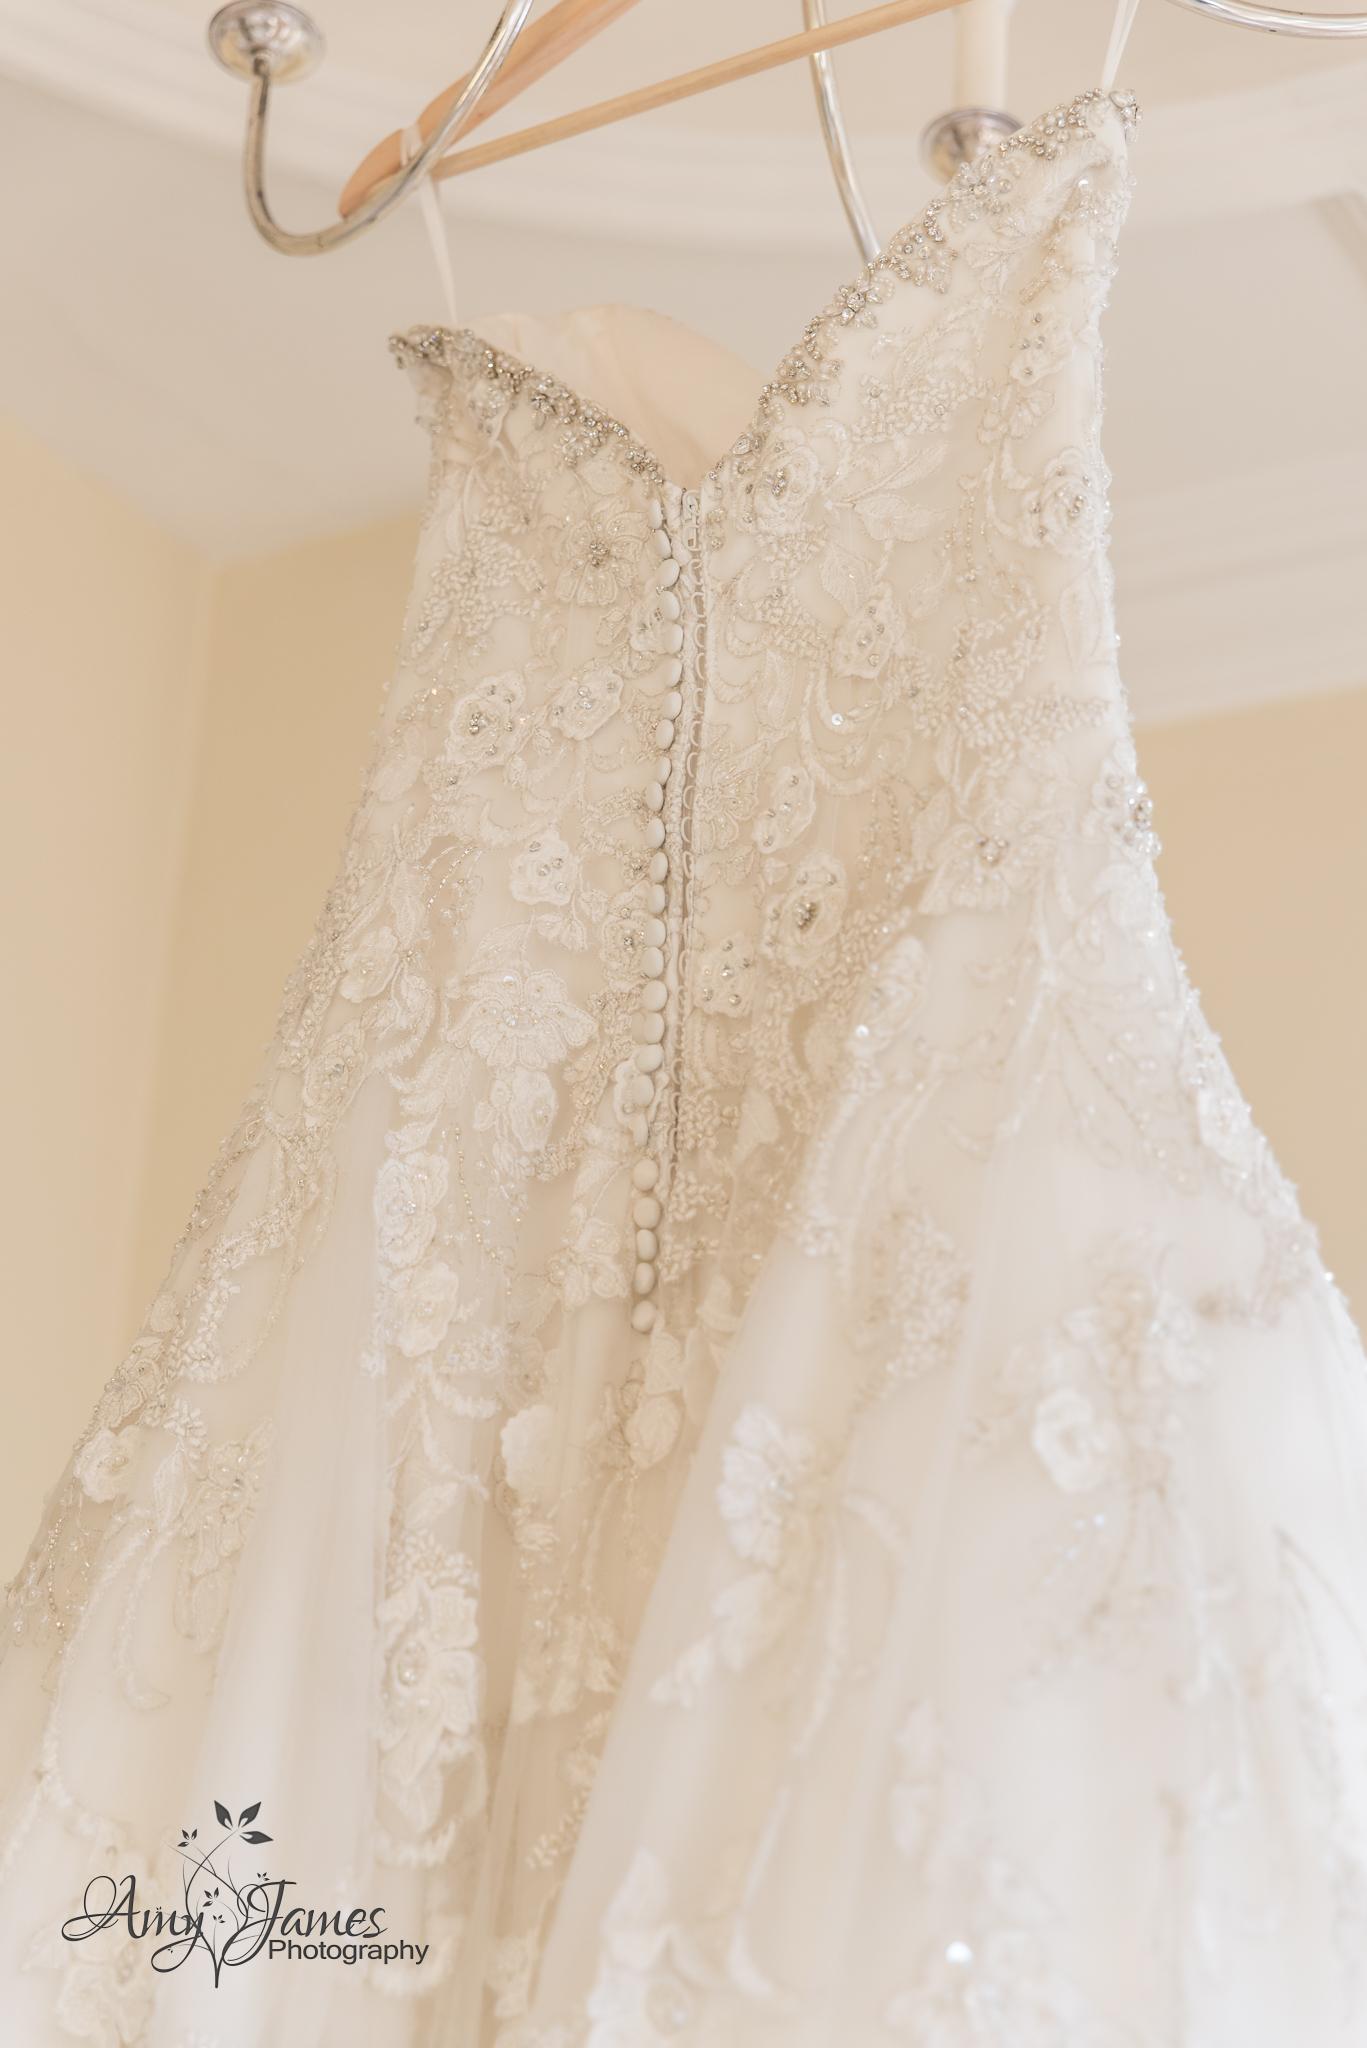 Frimley Hall Hotel Wedding Photographer // Hampshire wedding photographer